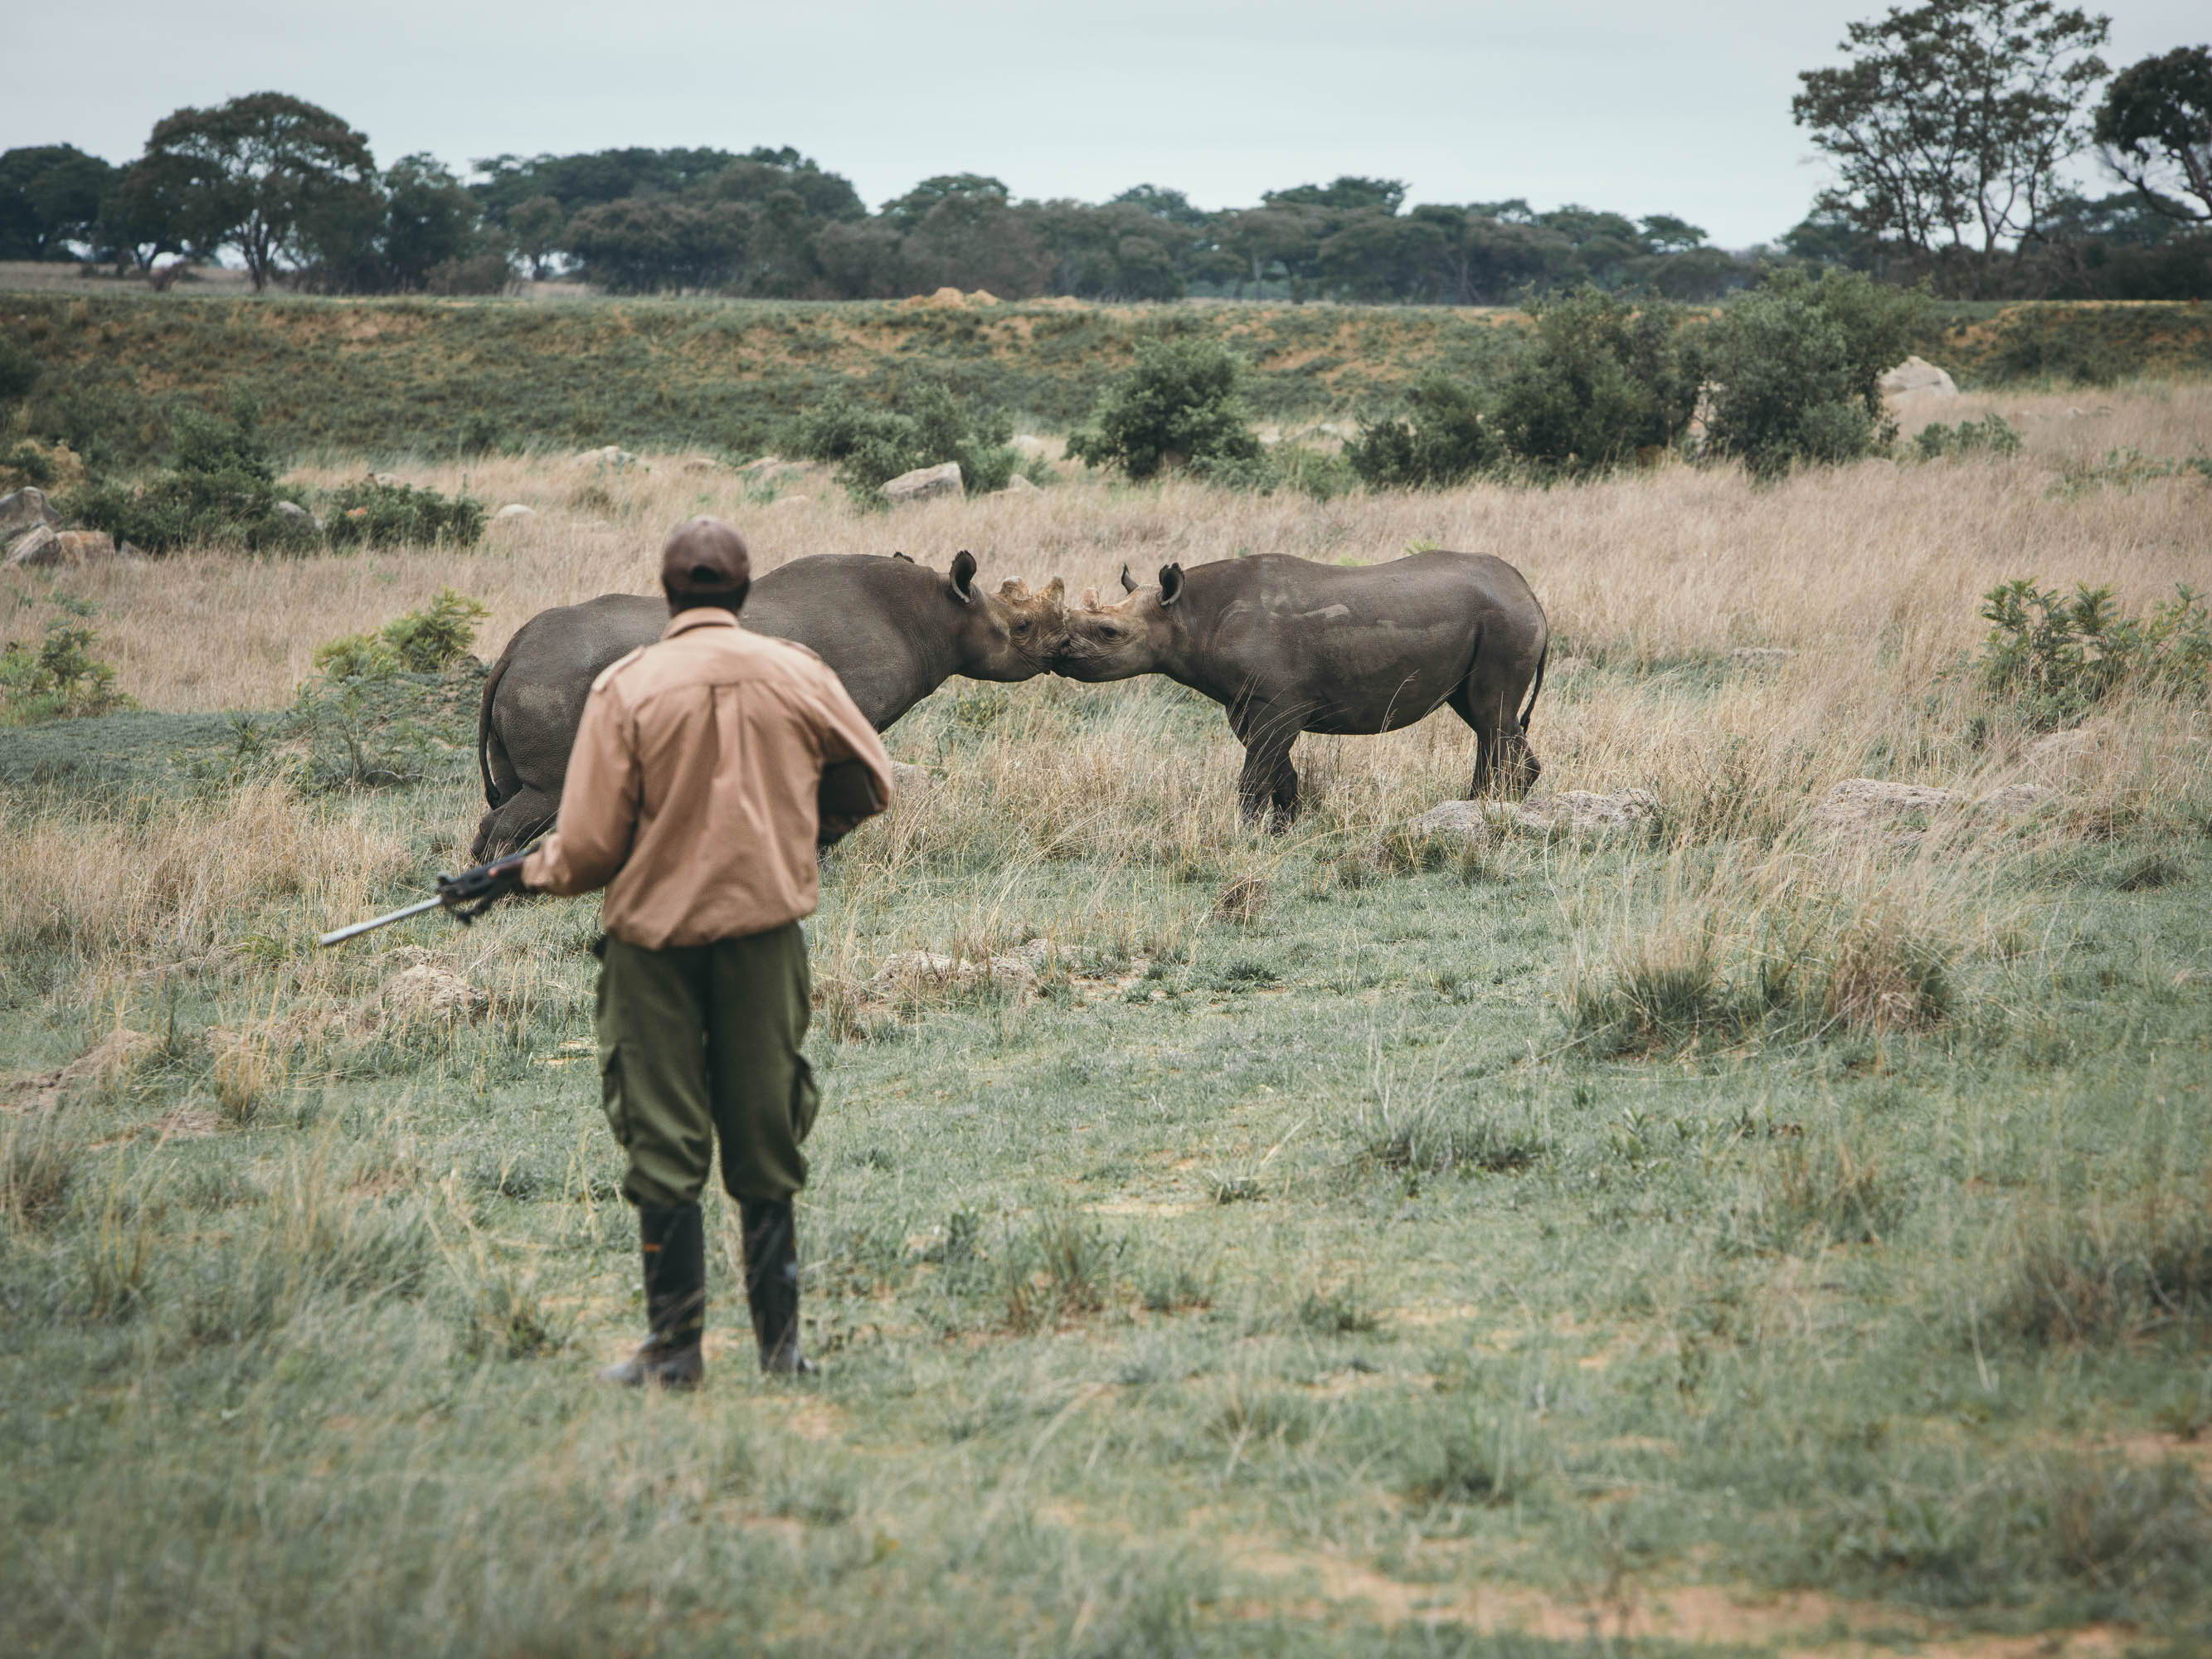 virtu growvirtu project kindness grow to inspire imire zimbabwe wildlife conservation save the rhino fence line protection of wildlife anti poaching stop poaching virtu bracelets bravery